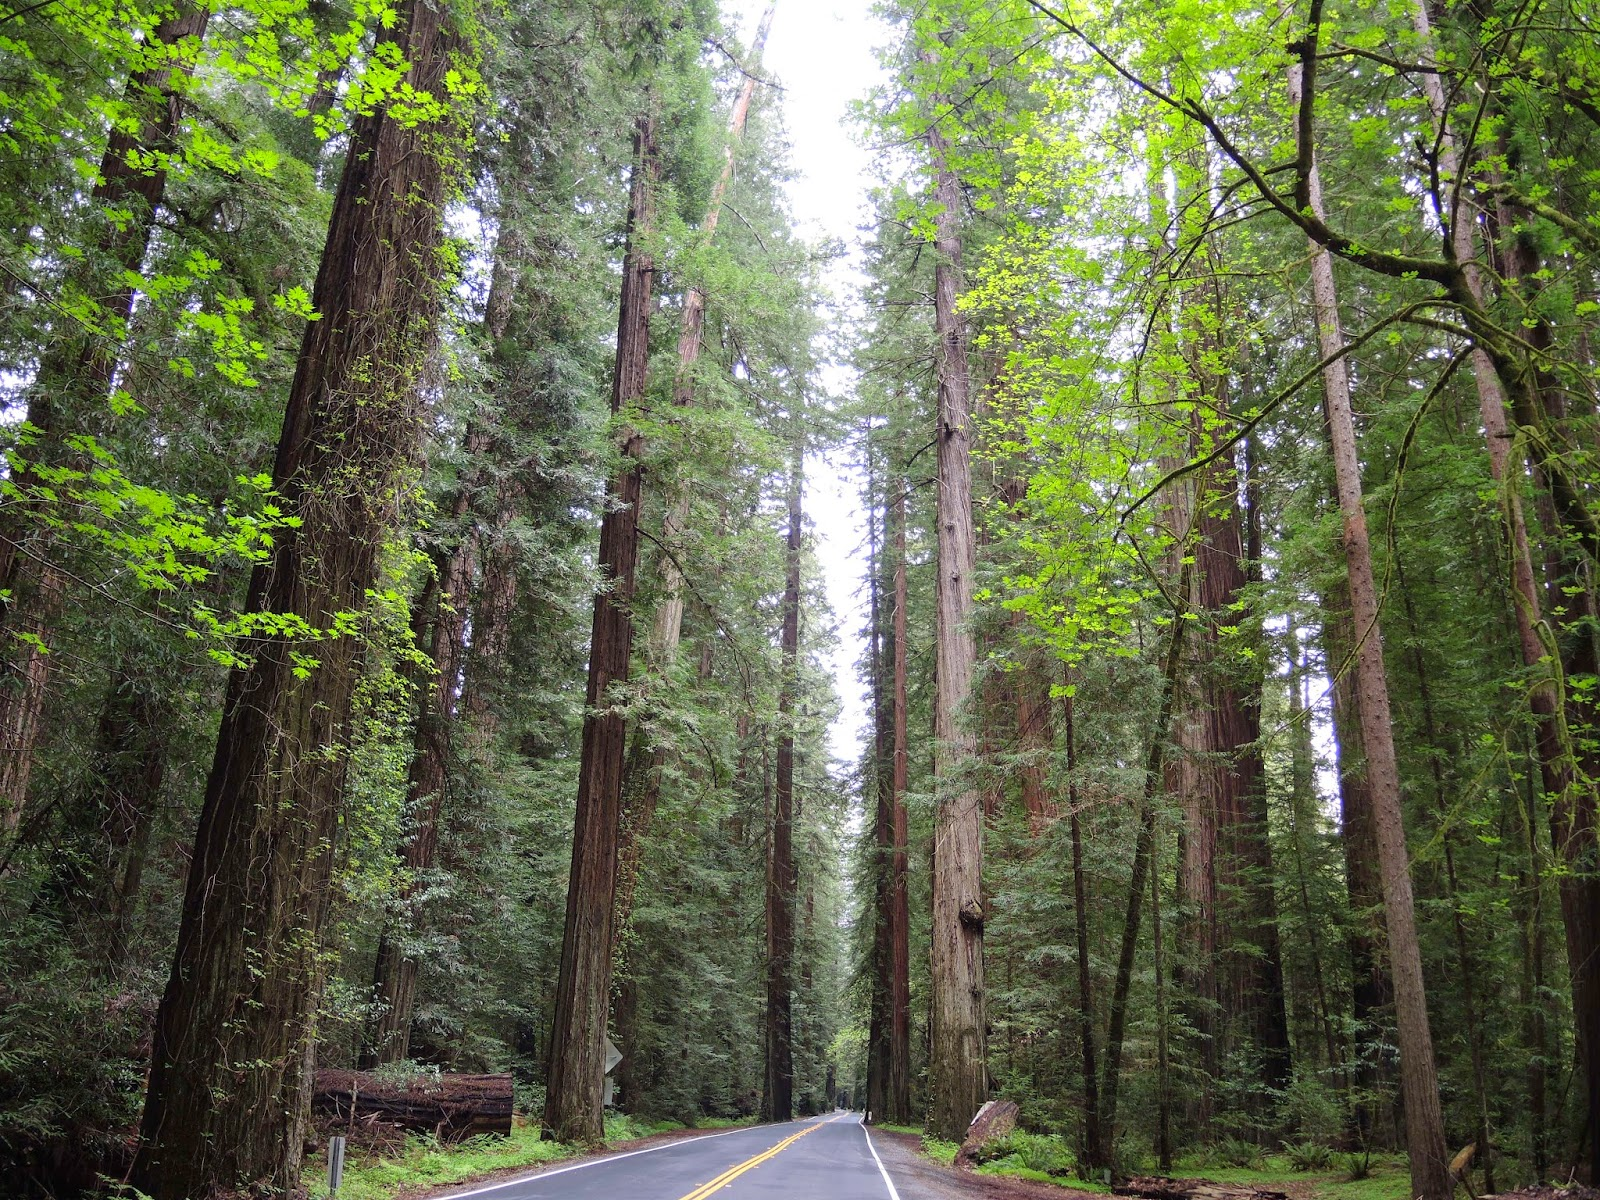 2014 Spring break 美國西岸自駕行程: Redwood national park 紅木國家公園